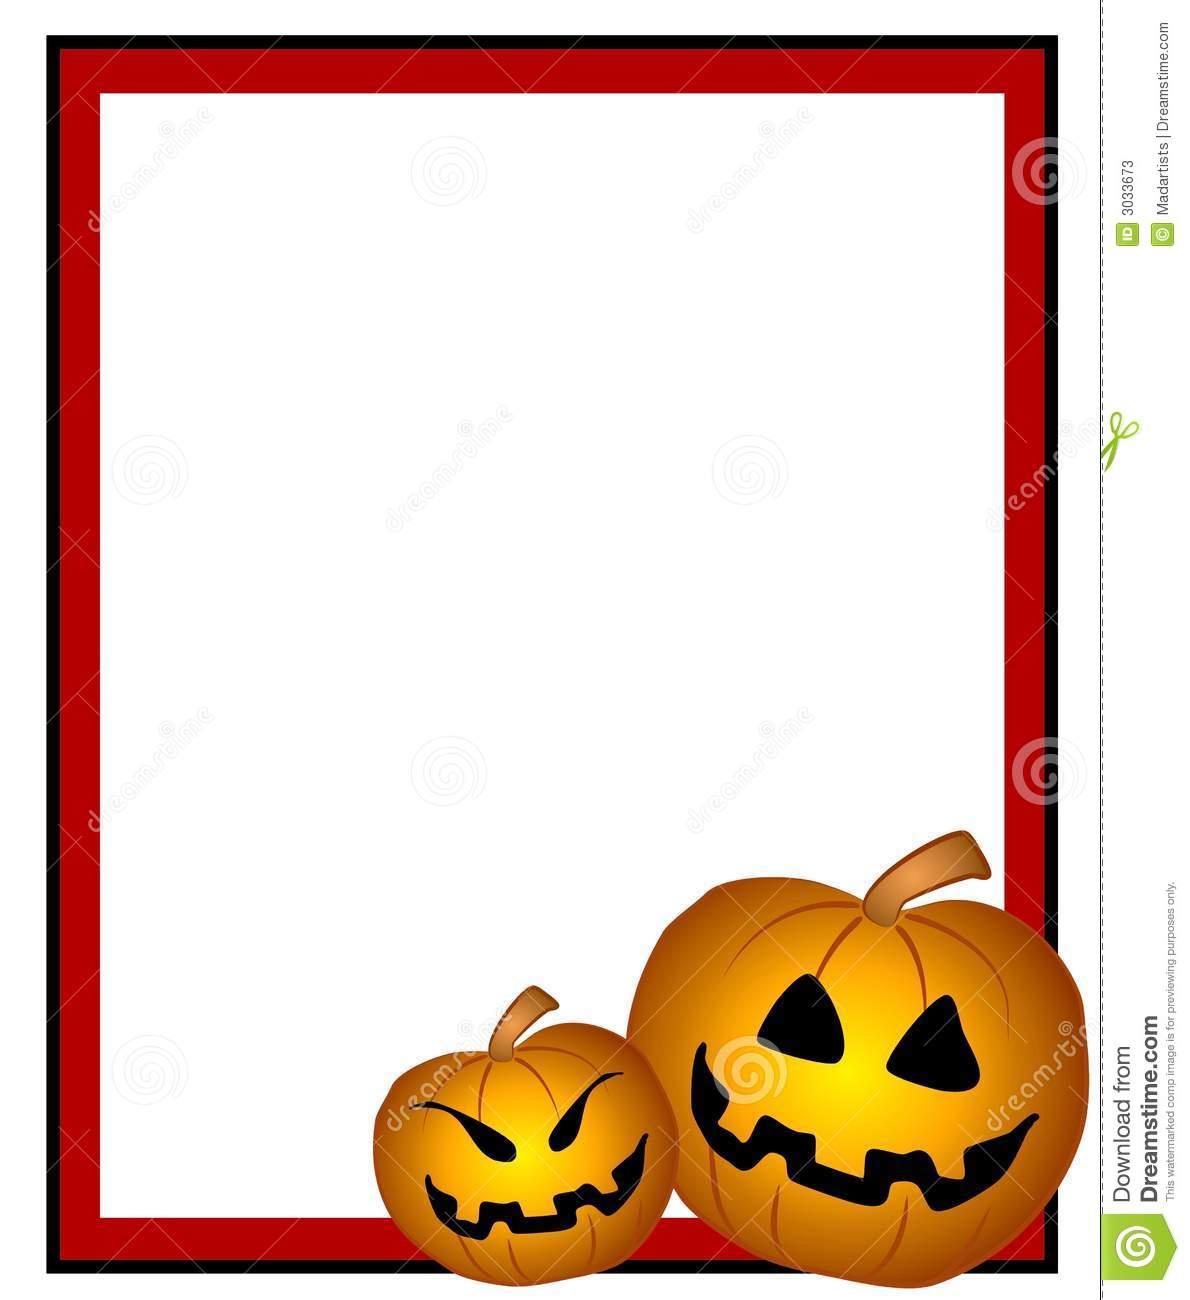 halloween border clipart clipart panda free clipart images rh clipartpanda com halloween candy border clipart halloween border clipart black and white